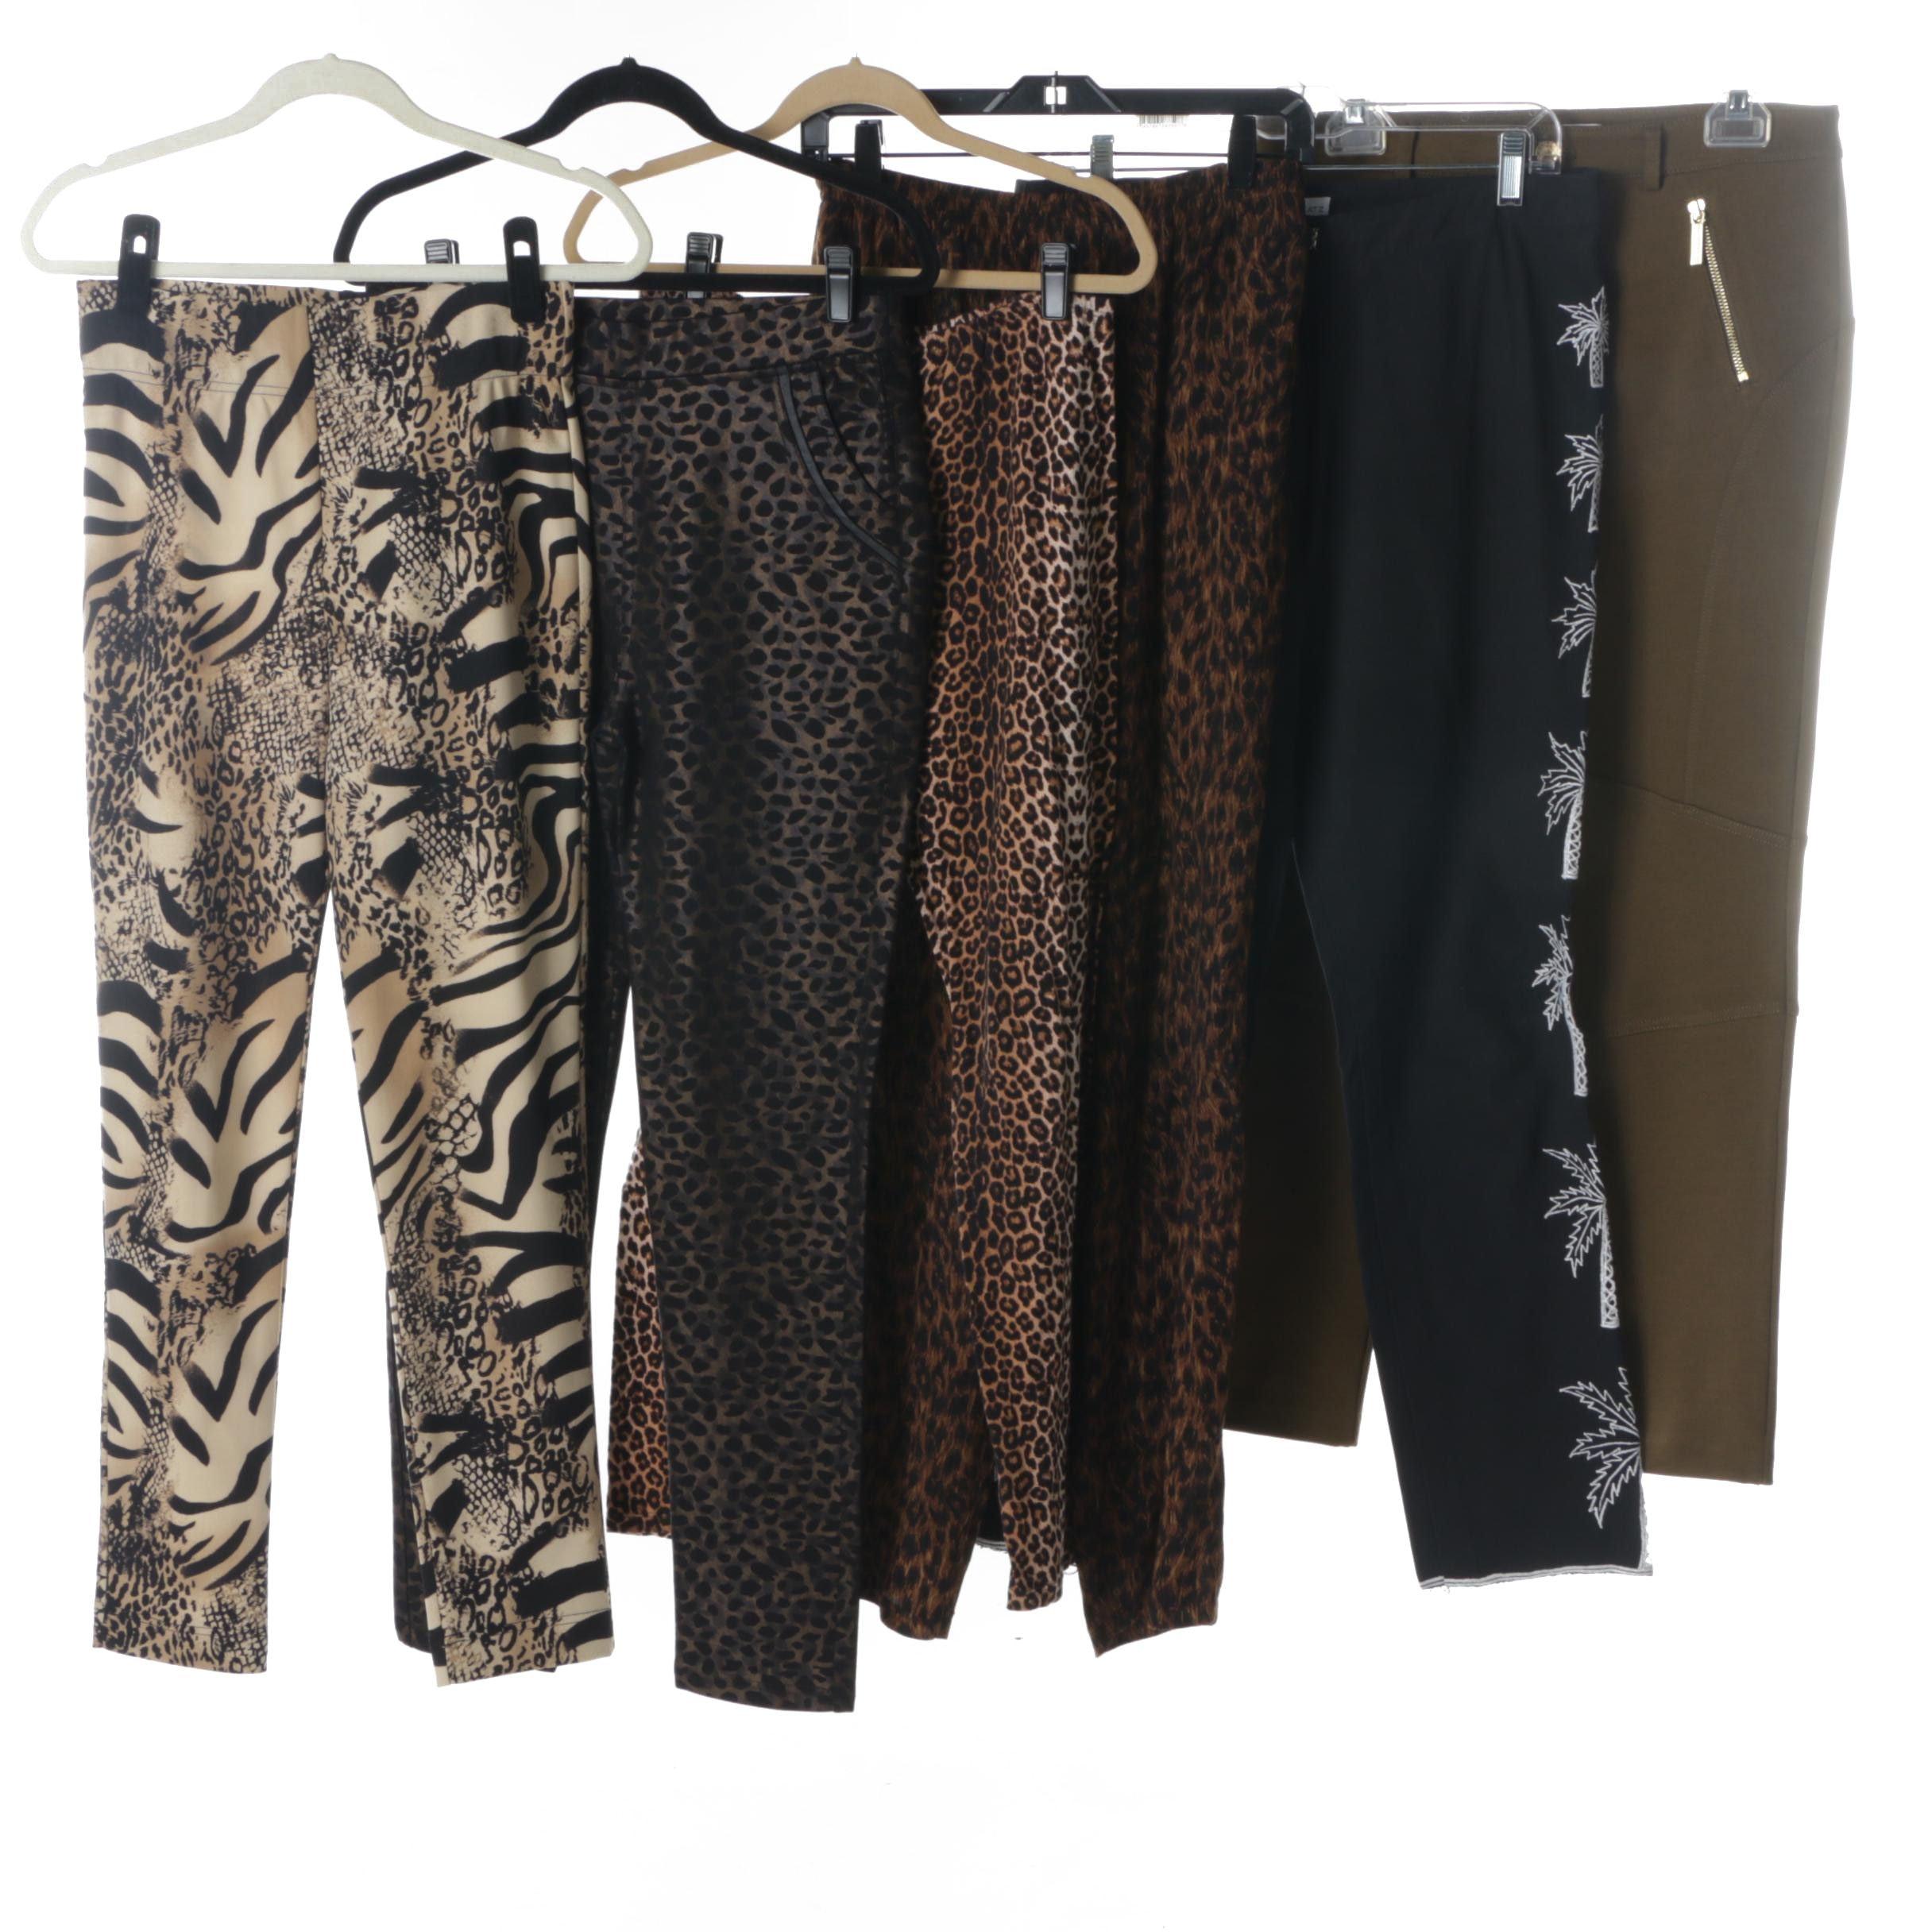 Women's Pants Including MICHAEL Michael Kors and Tamara Catz